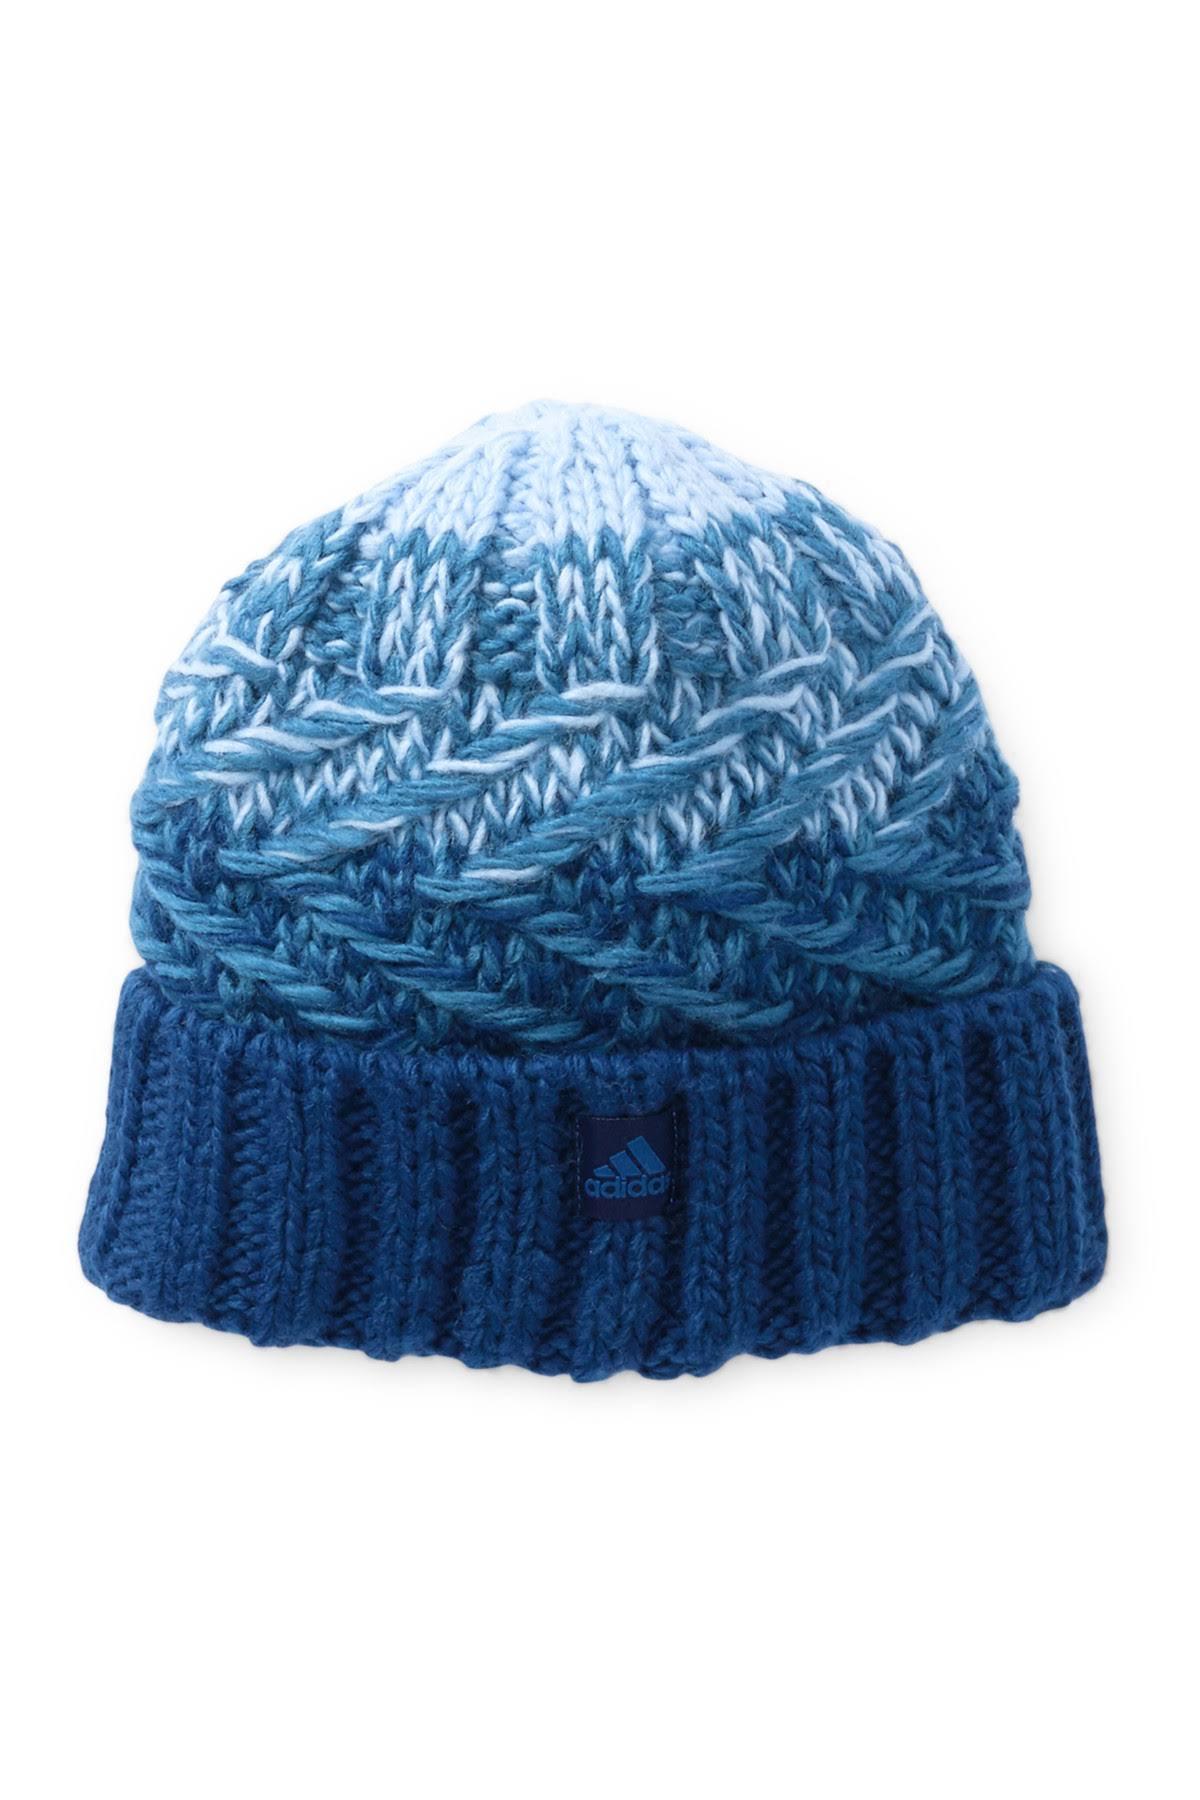 Canyon De Beanie Doblado Adidas Blue En Punto Rack El Nordstrom dEZ5wxqS7w